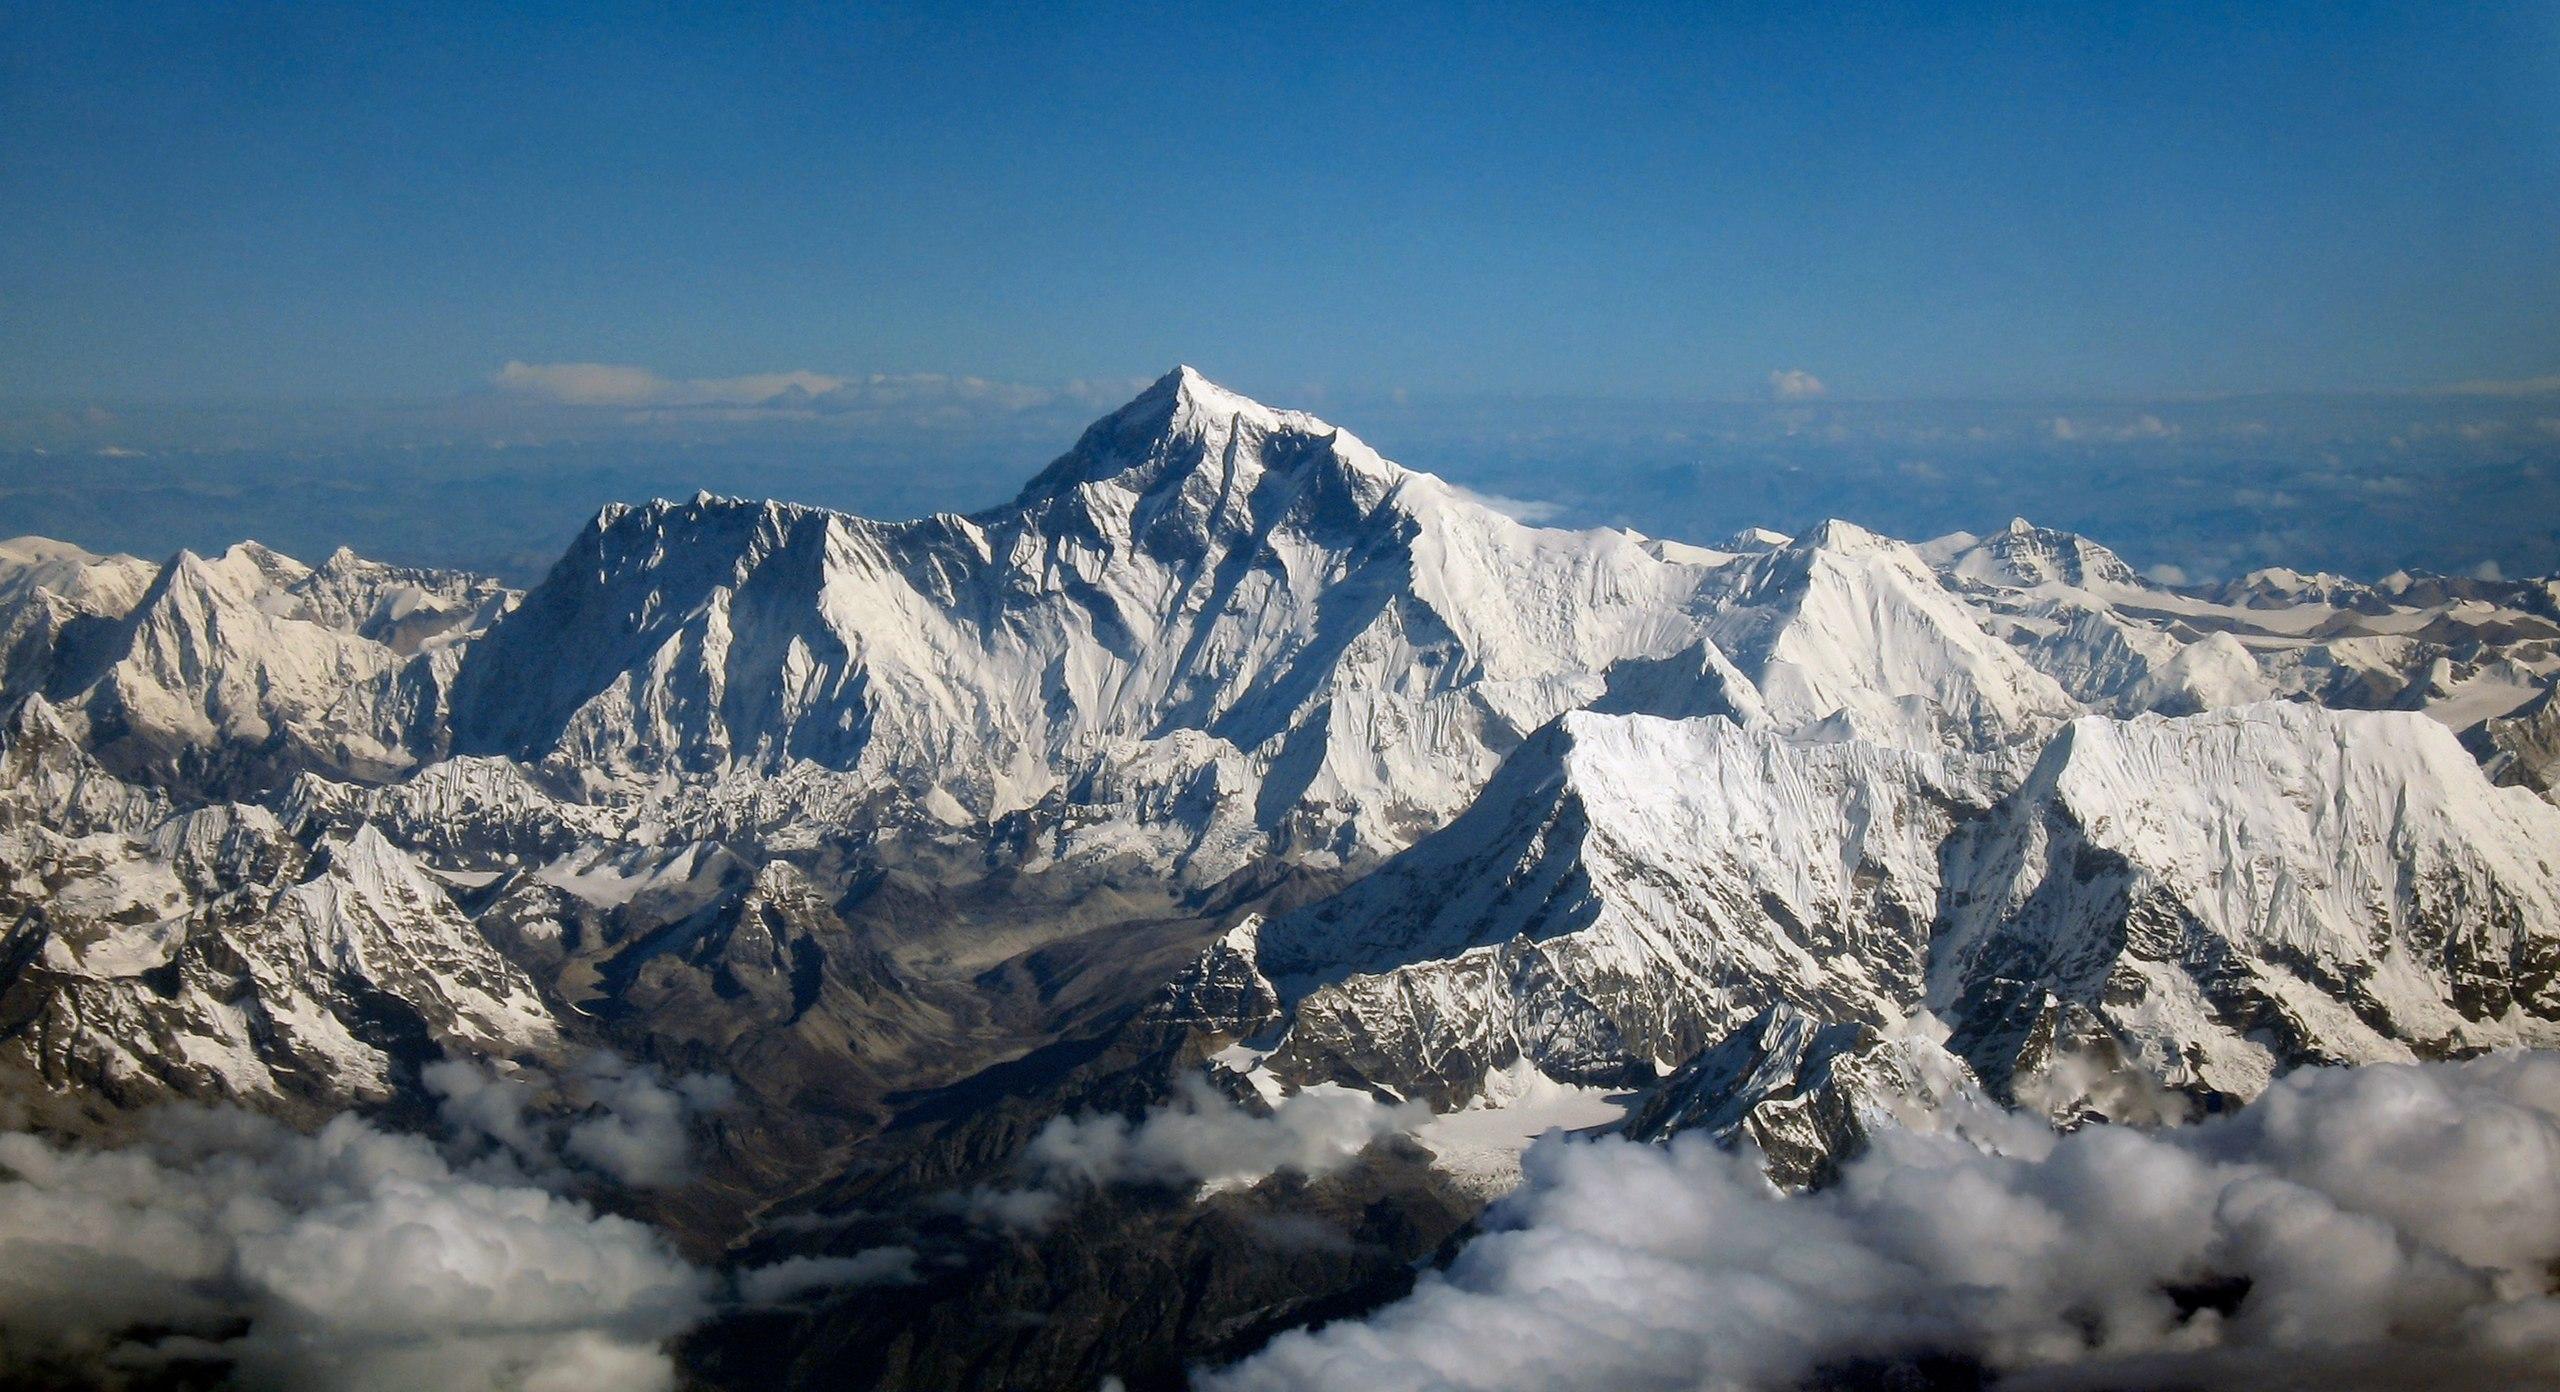 2560px Mount Everest as seen from Drukair2 PLW edit